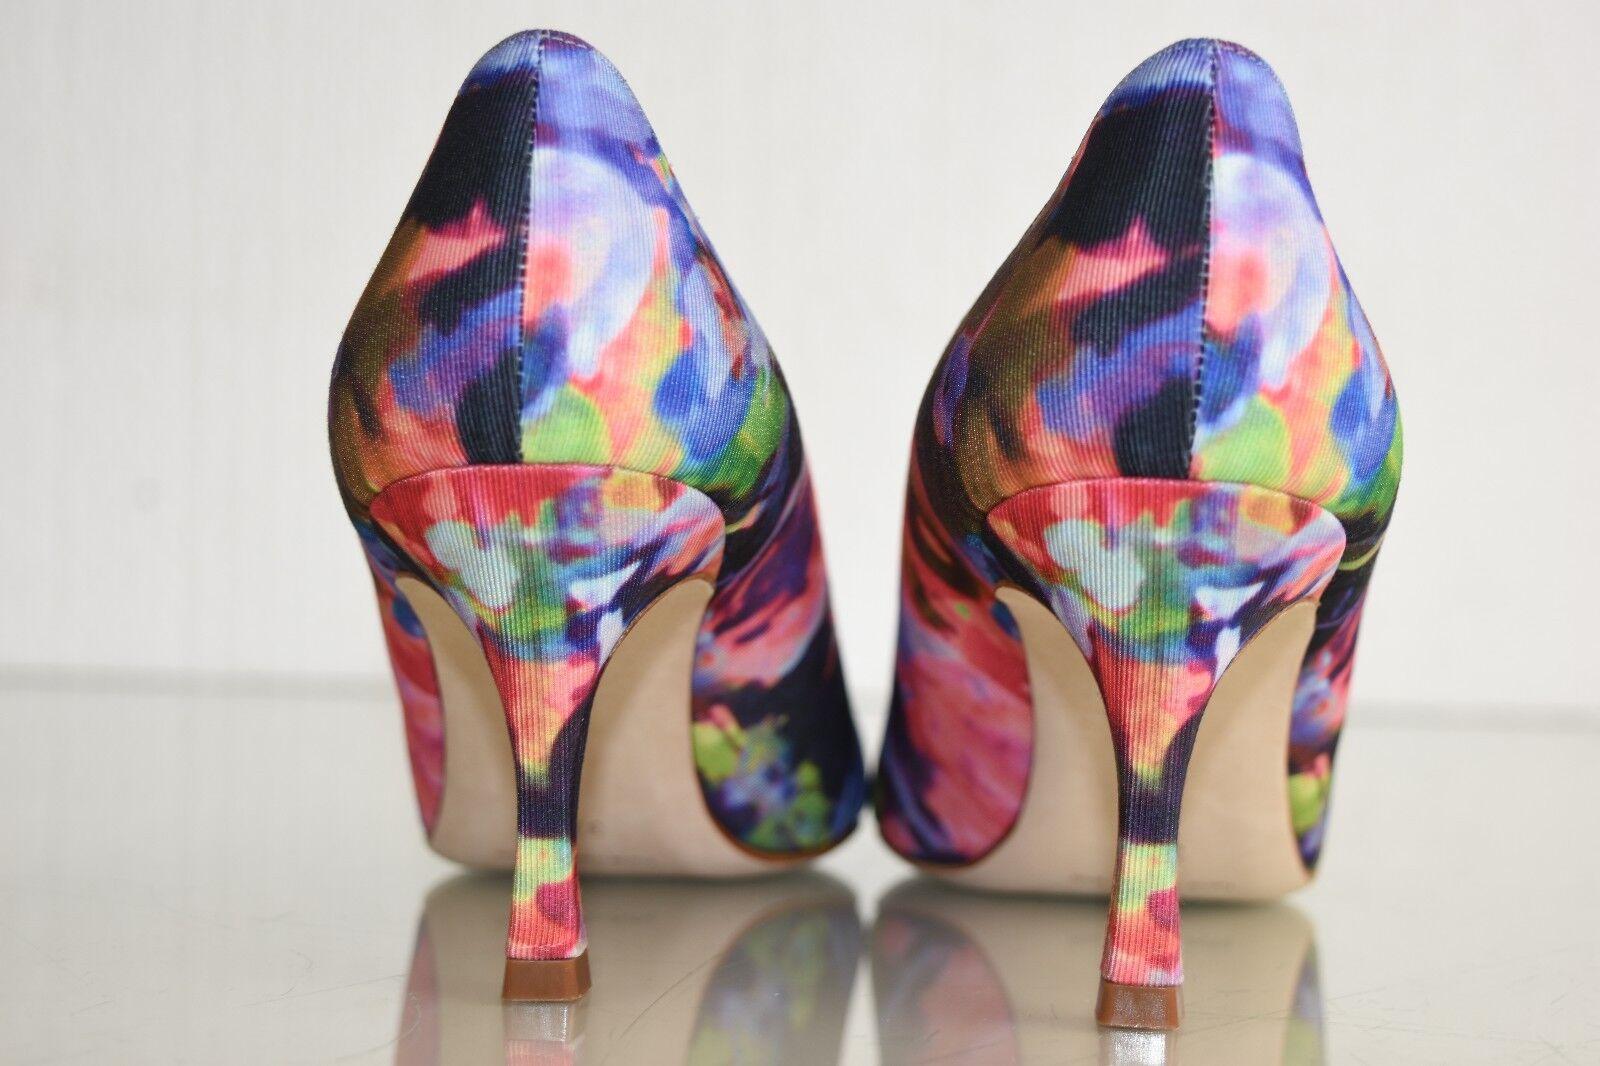 New MANOLO Pink BLAHNIK BB Pumps Floral Pink MANOLO blau Purple Heels Patent schuhes 37.5 40.5 cafe44